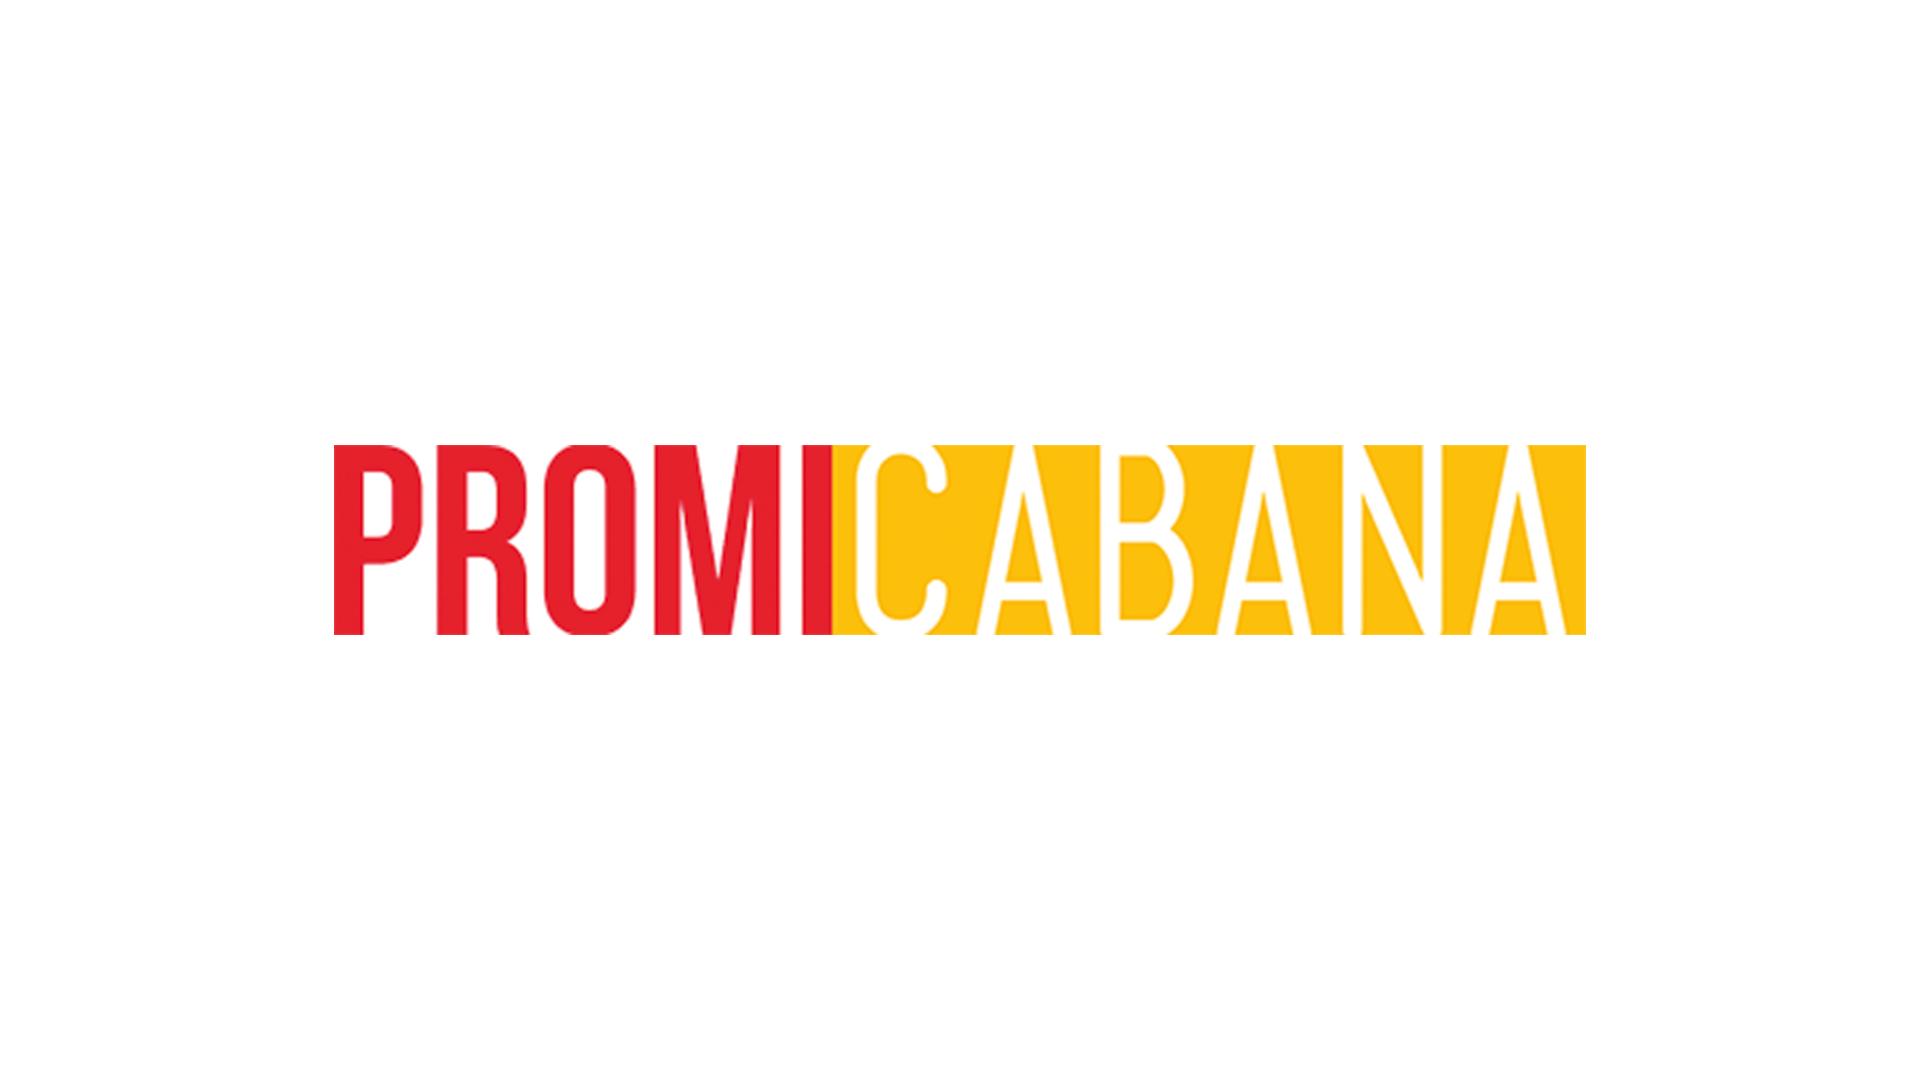 Chris-Pratt-Jimmy-Kimmel